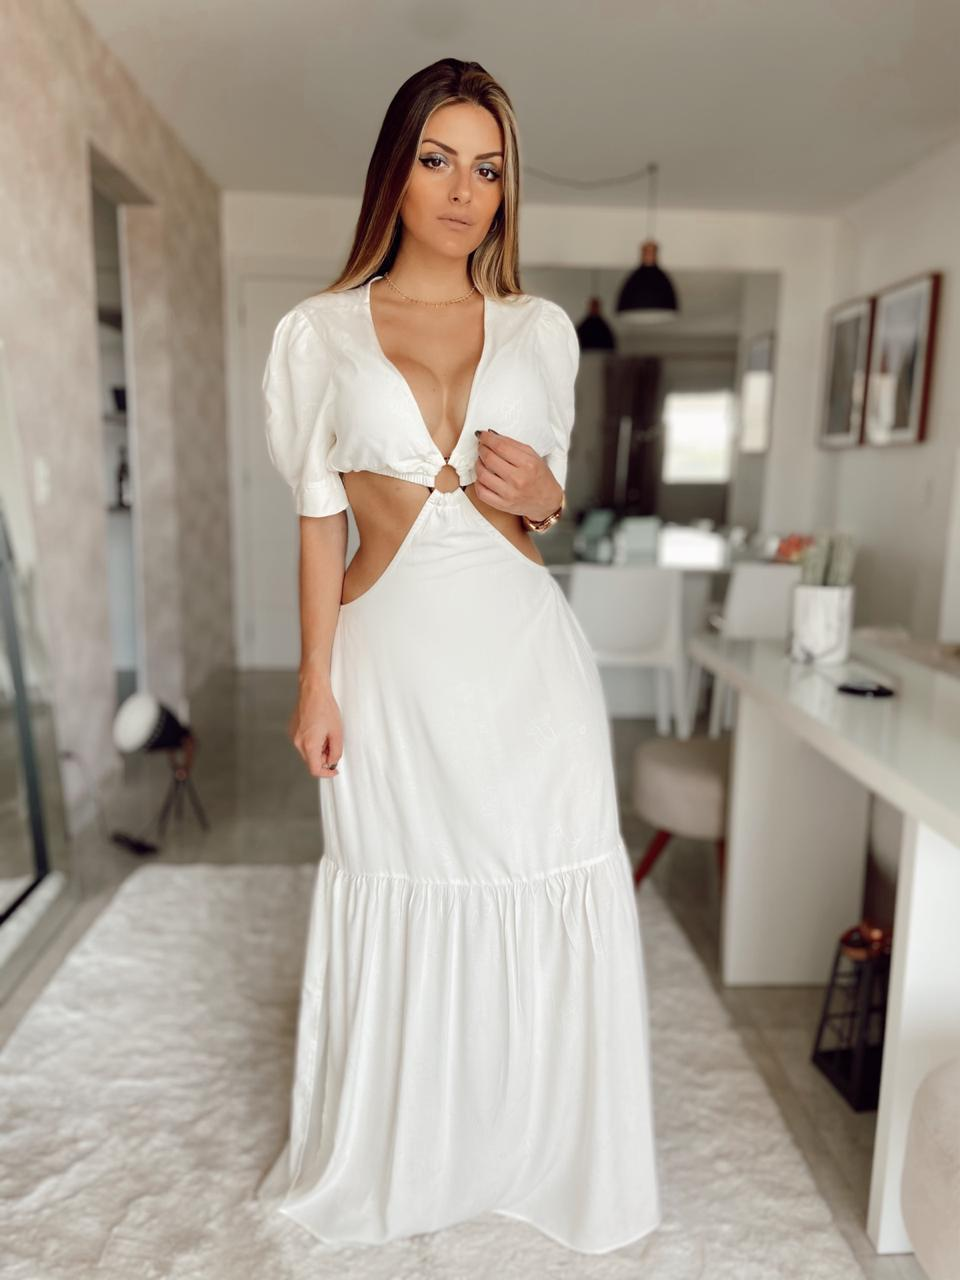 Vestido Longo Decotado - LORRANY E WANESSA MODAS